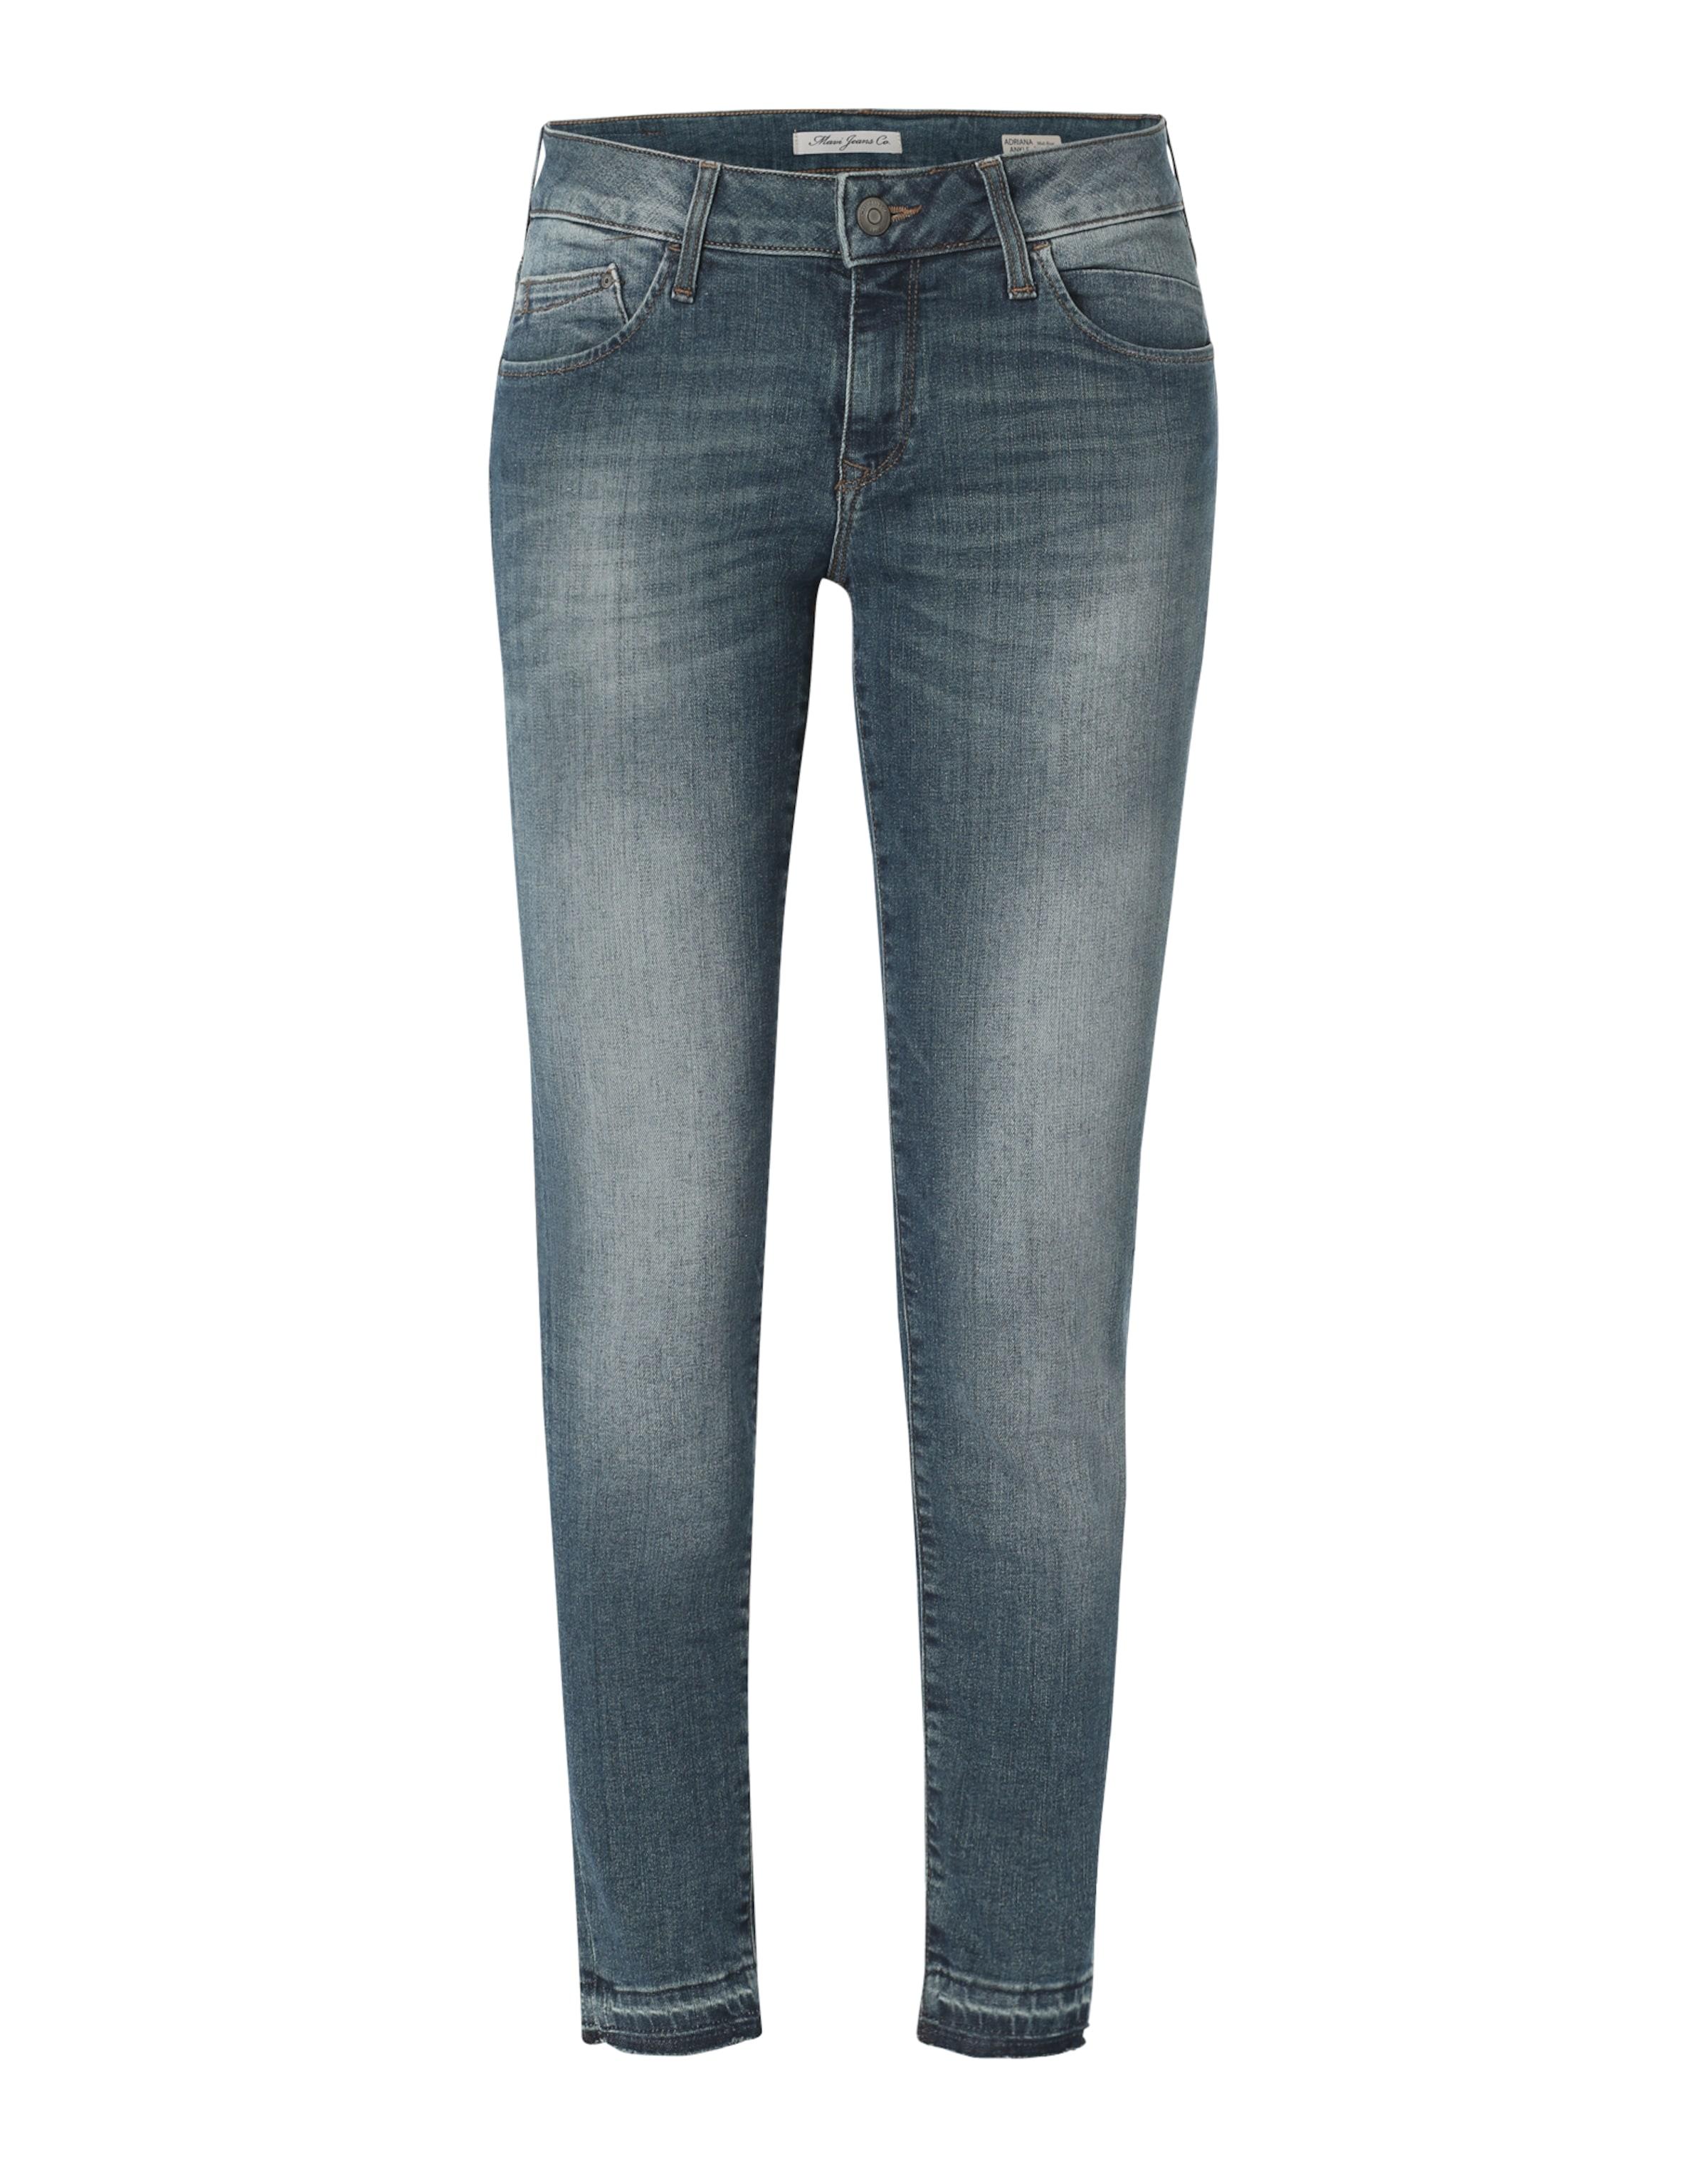 Mavi In Blau 'adriana' In Mavi 'adriana' Jeans Jeans 6If7vybYgm